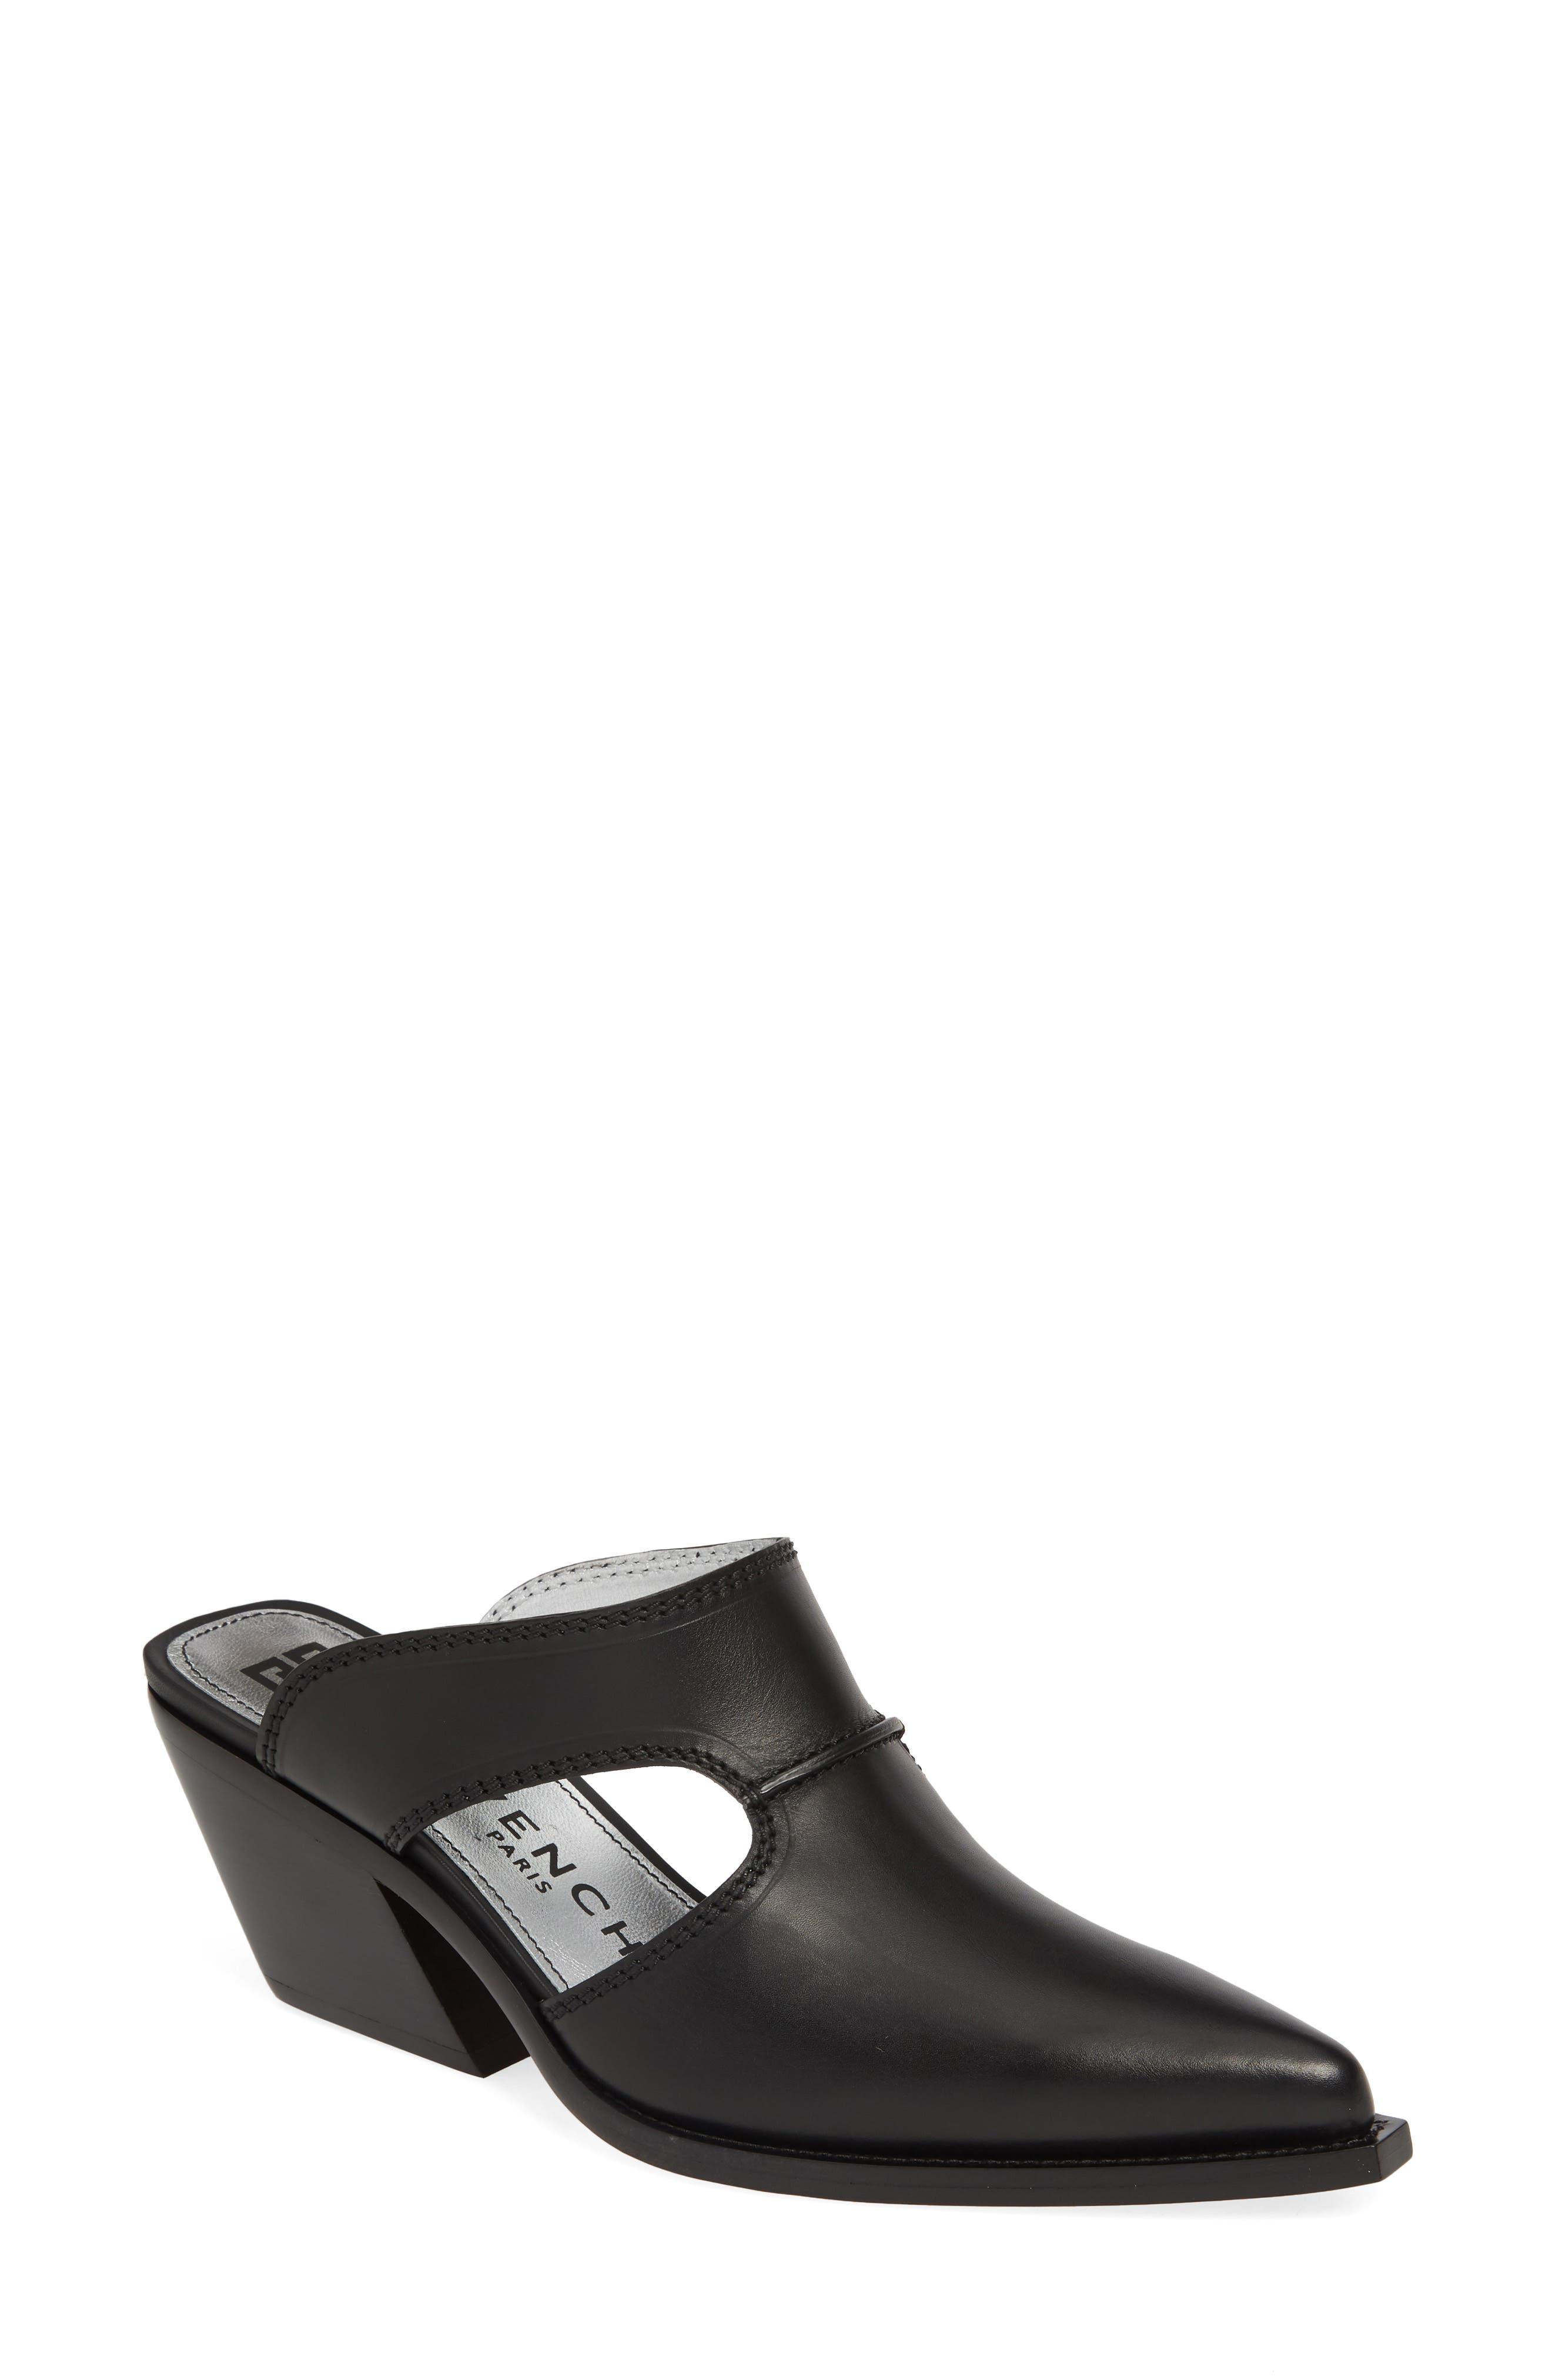 Givenchy Cowboy Mule, Black